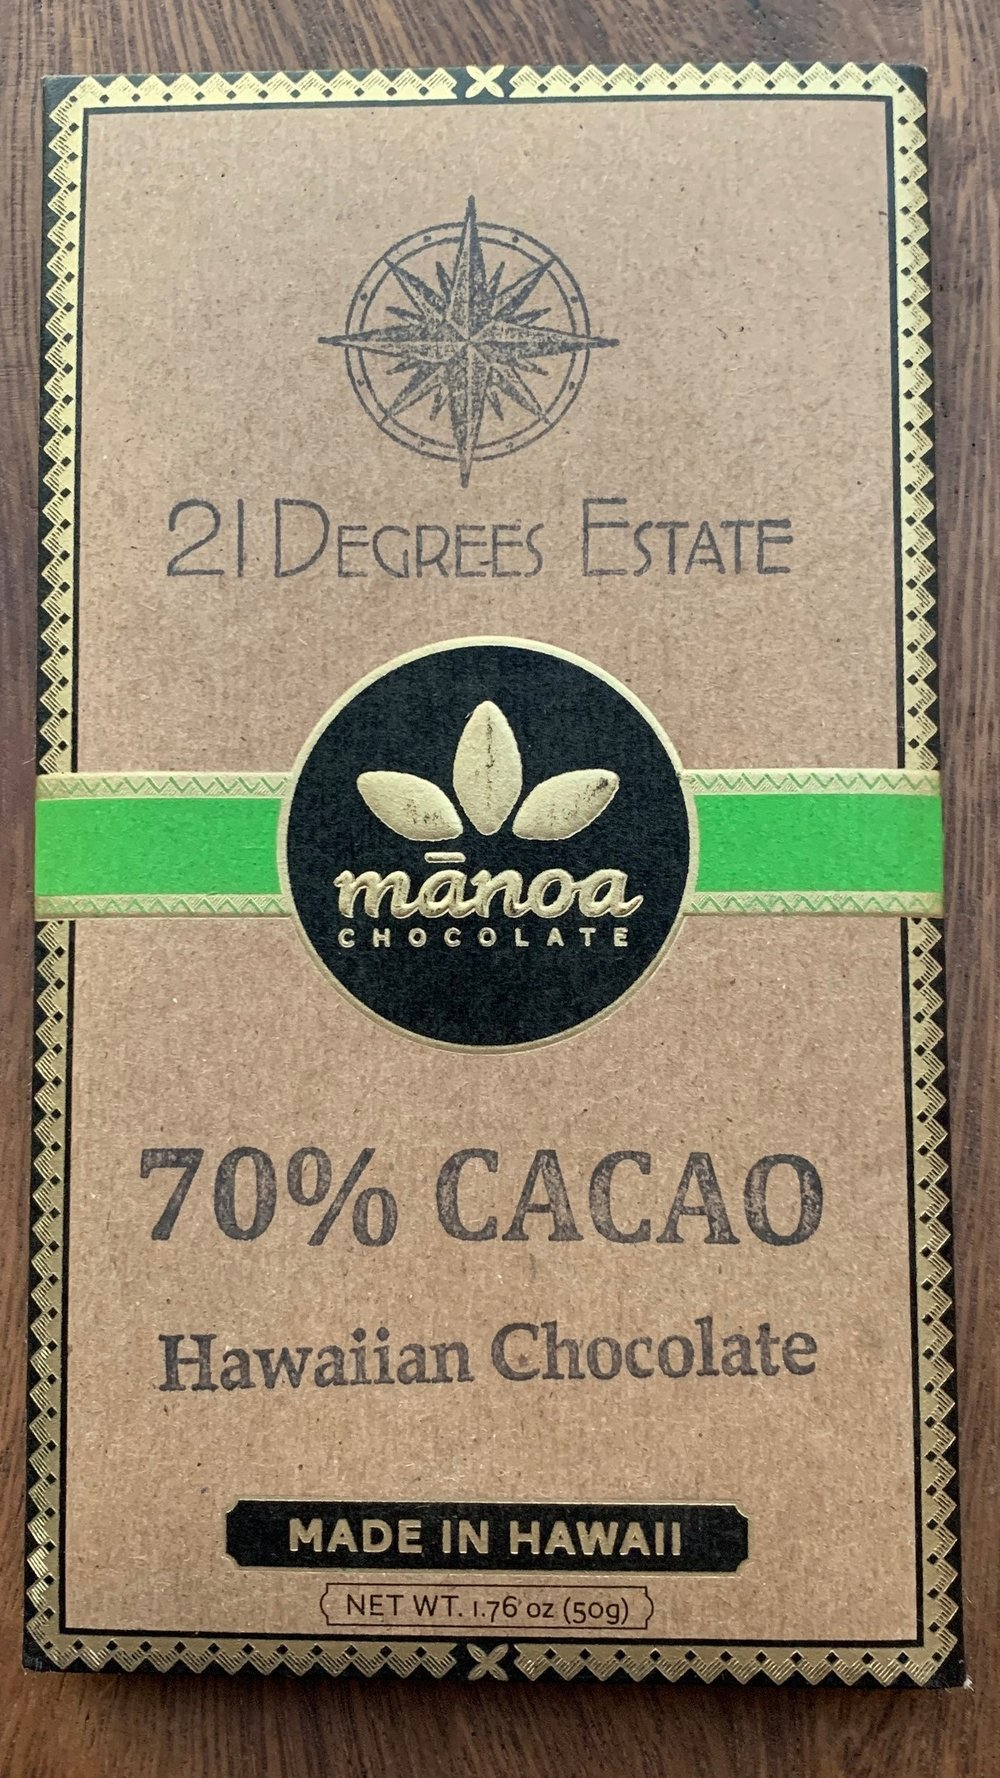 21º Estate / Manoa - Heavy Chocolate, mildly fruity.